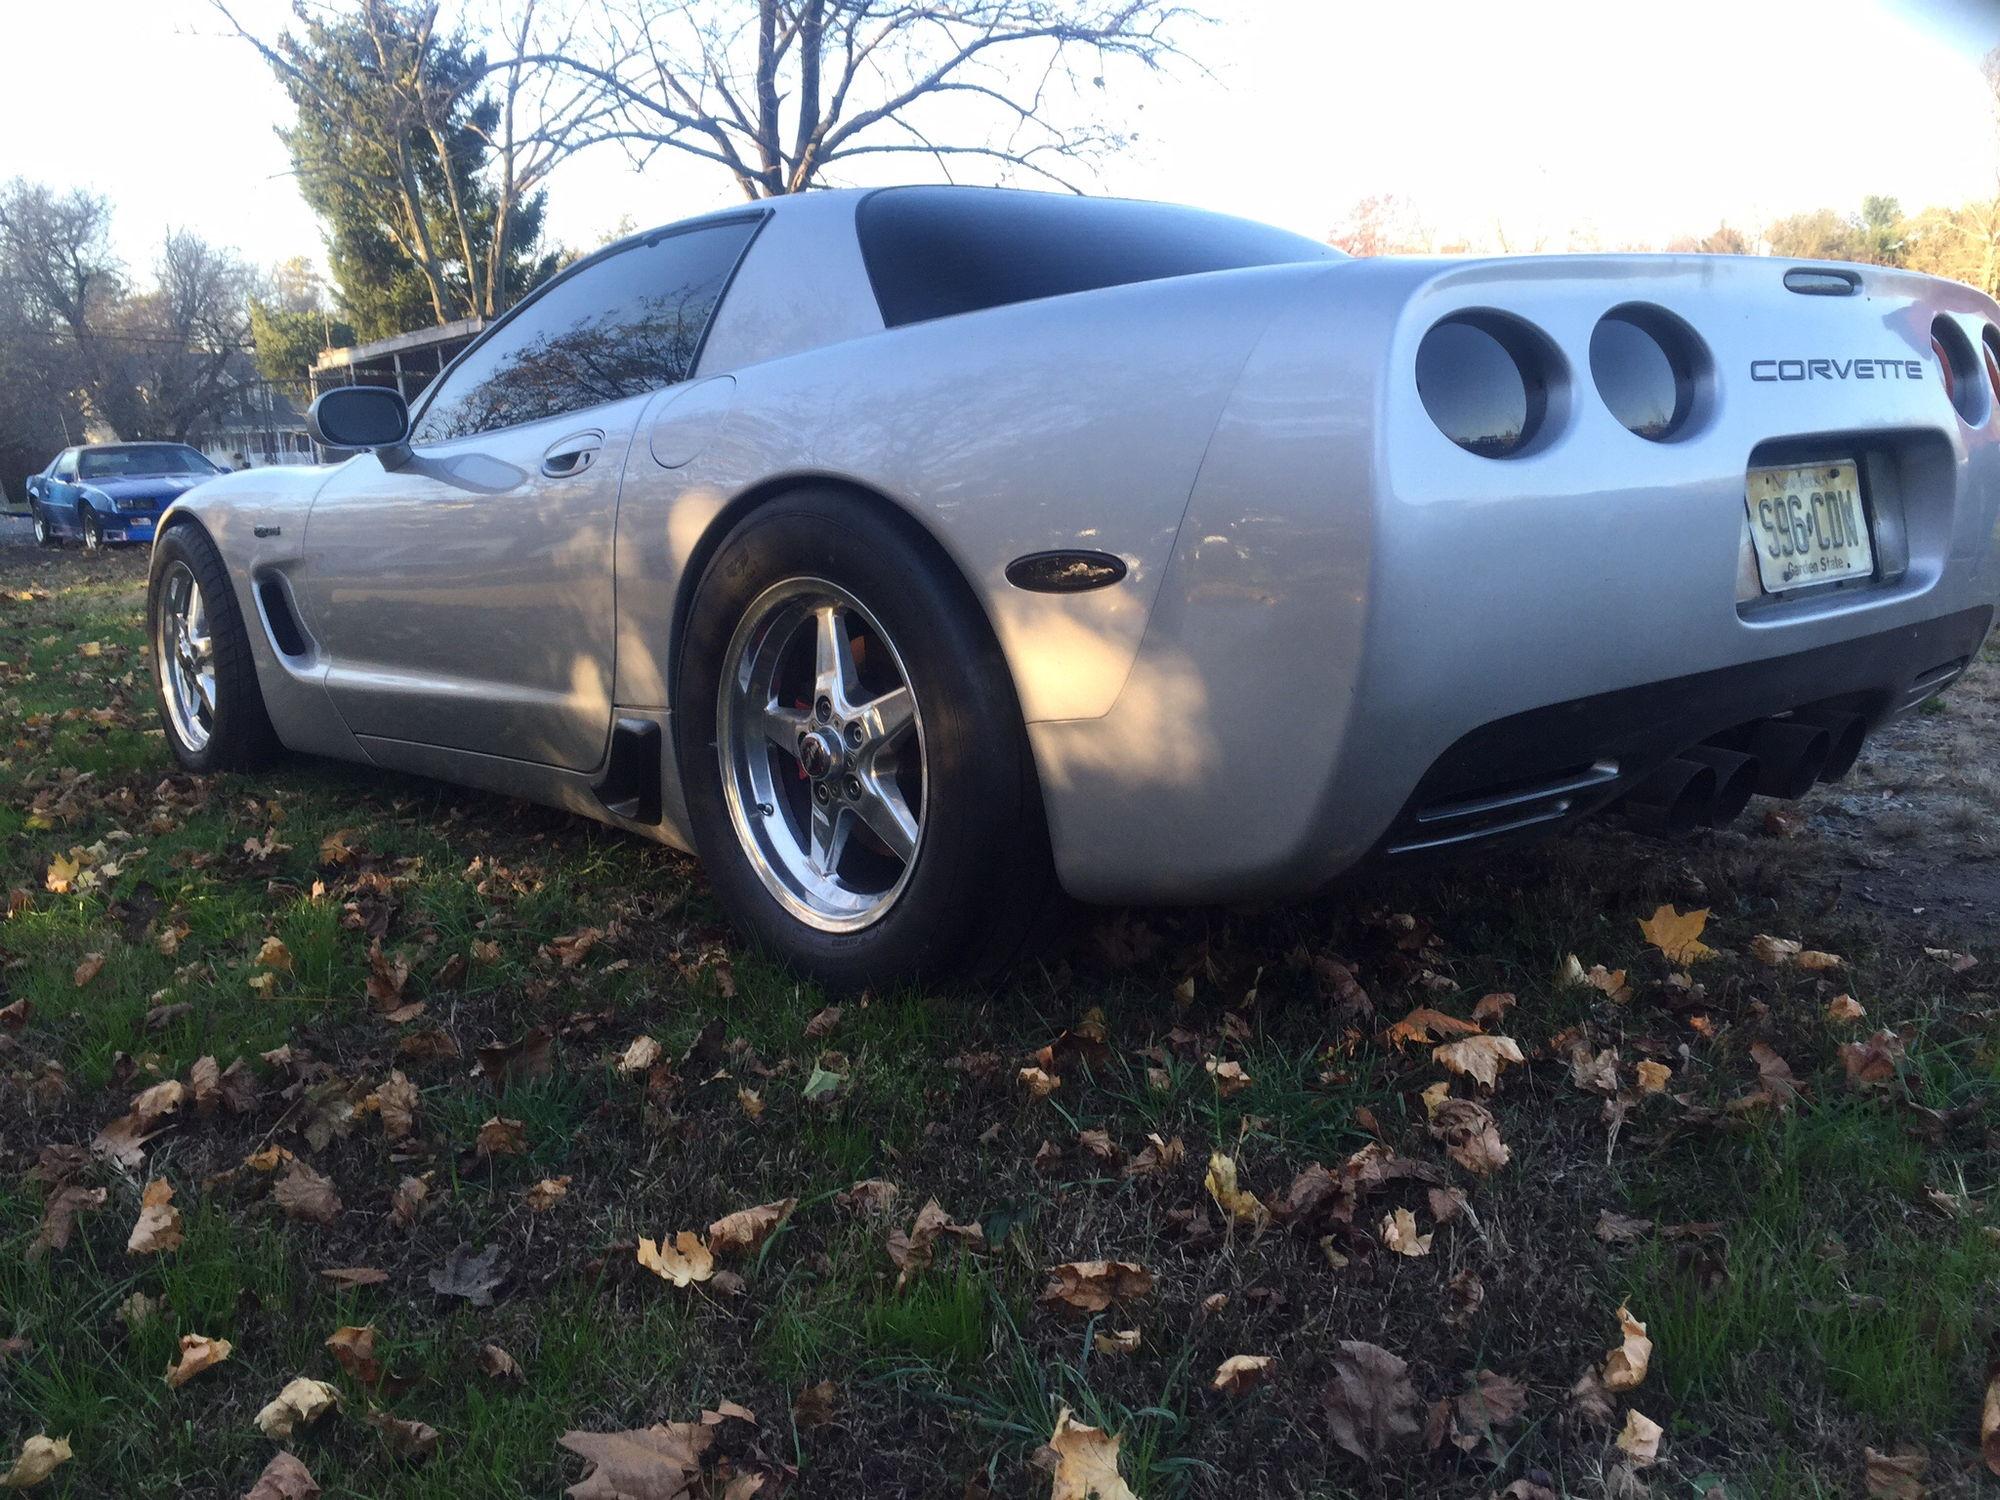 2001 Corvette Zo6 Roller Fully Built Drivetrain Ls1tech